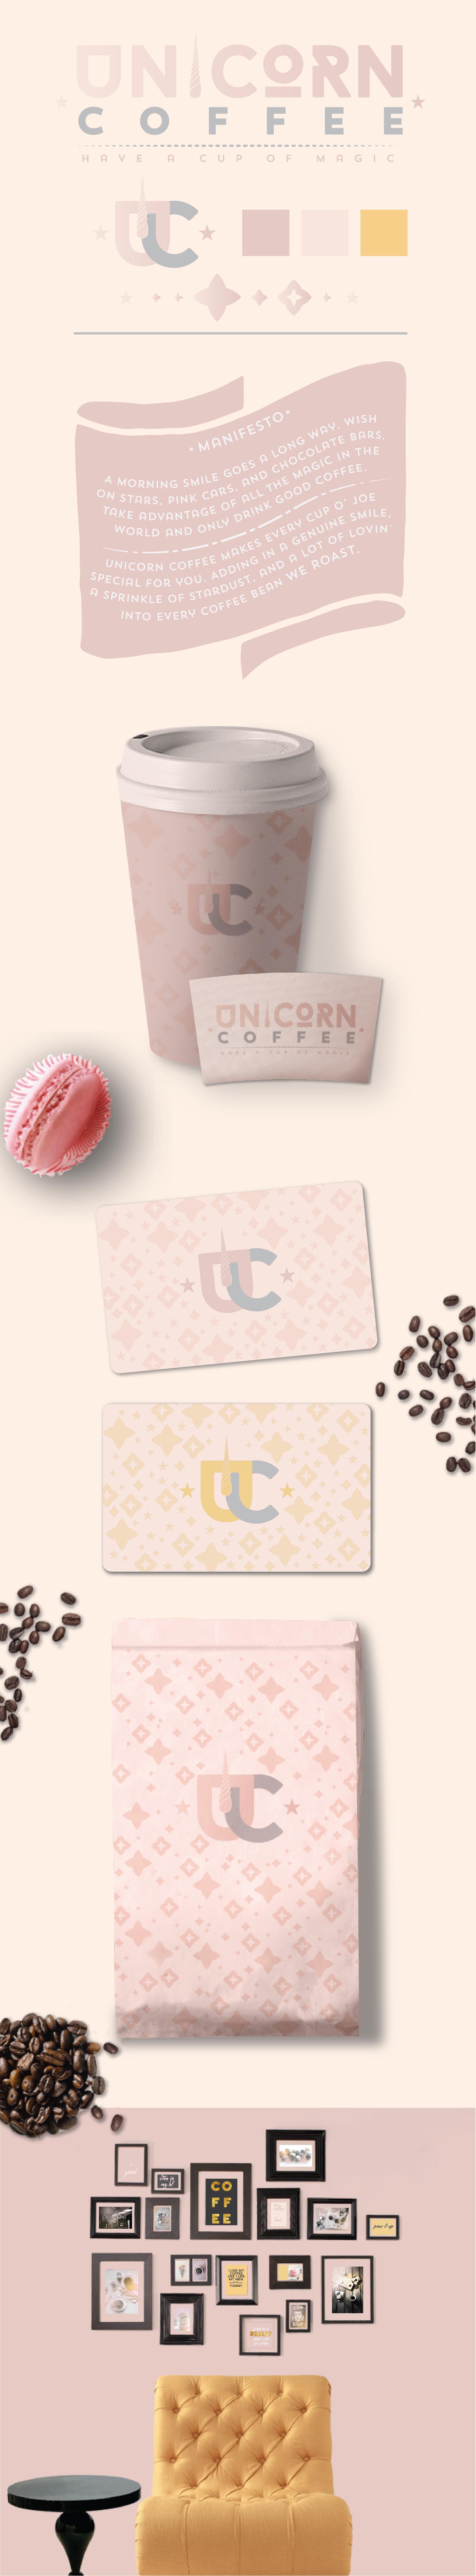 Unicorn_Coffee.jpg